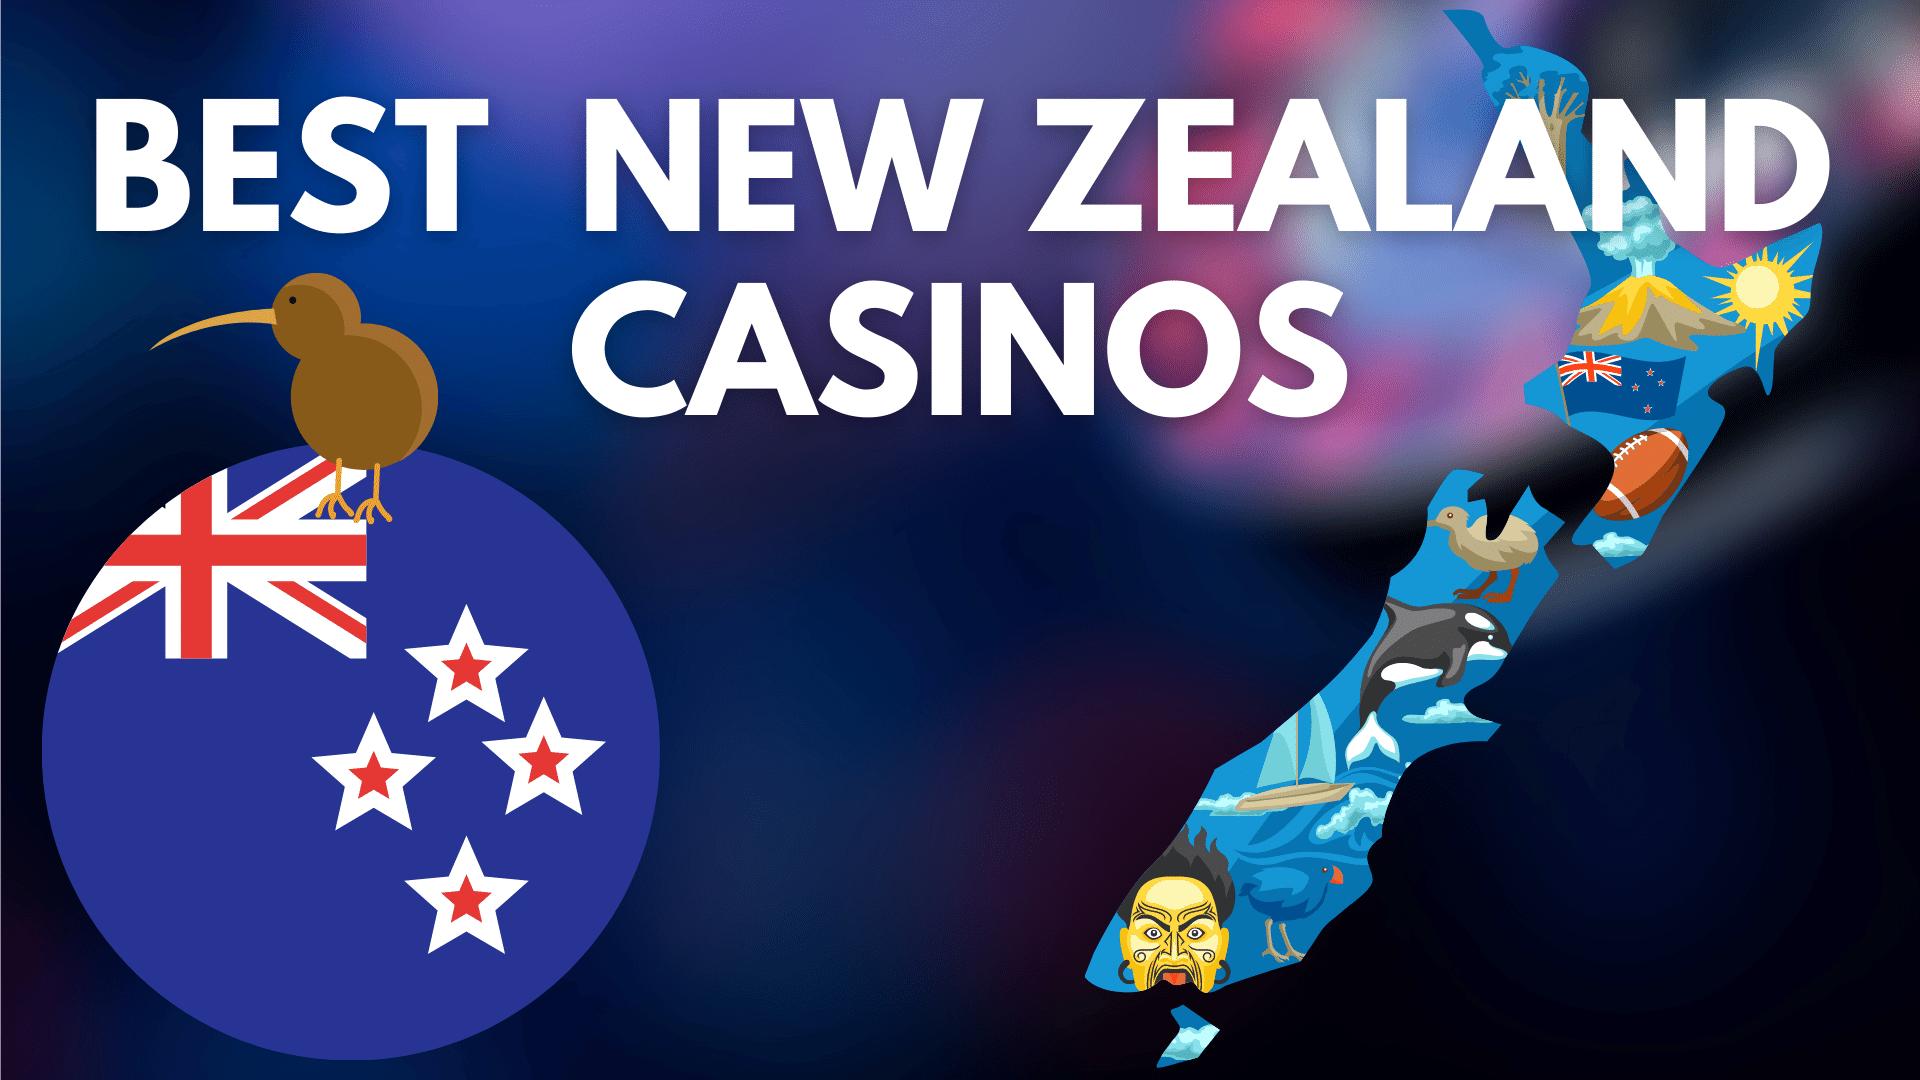 Best New Zealand Casinos